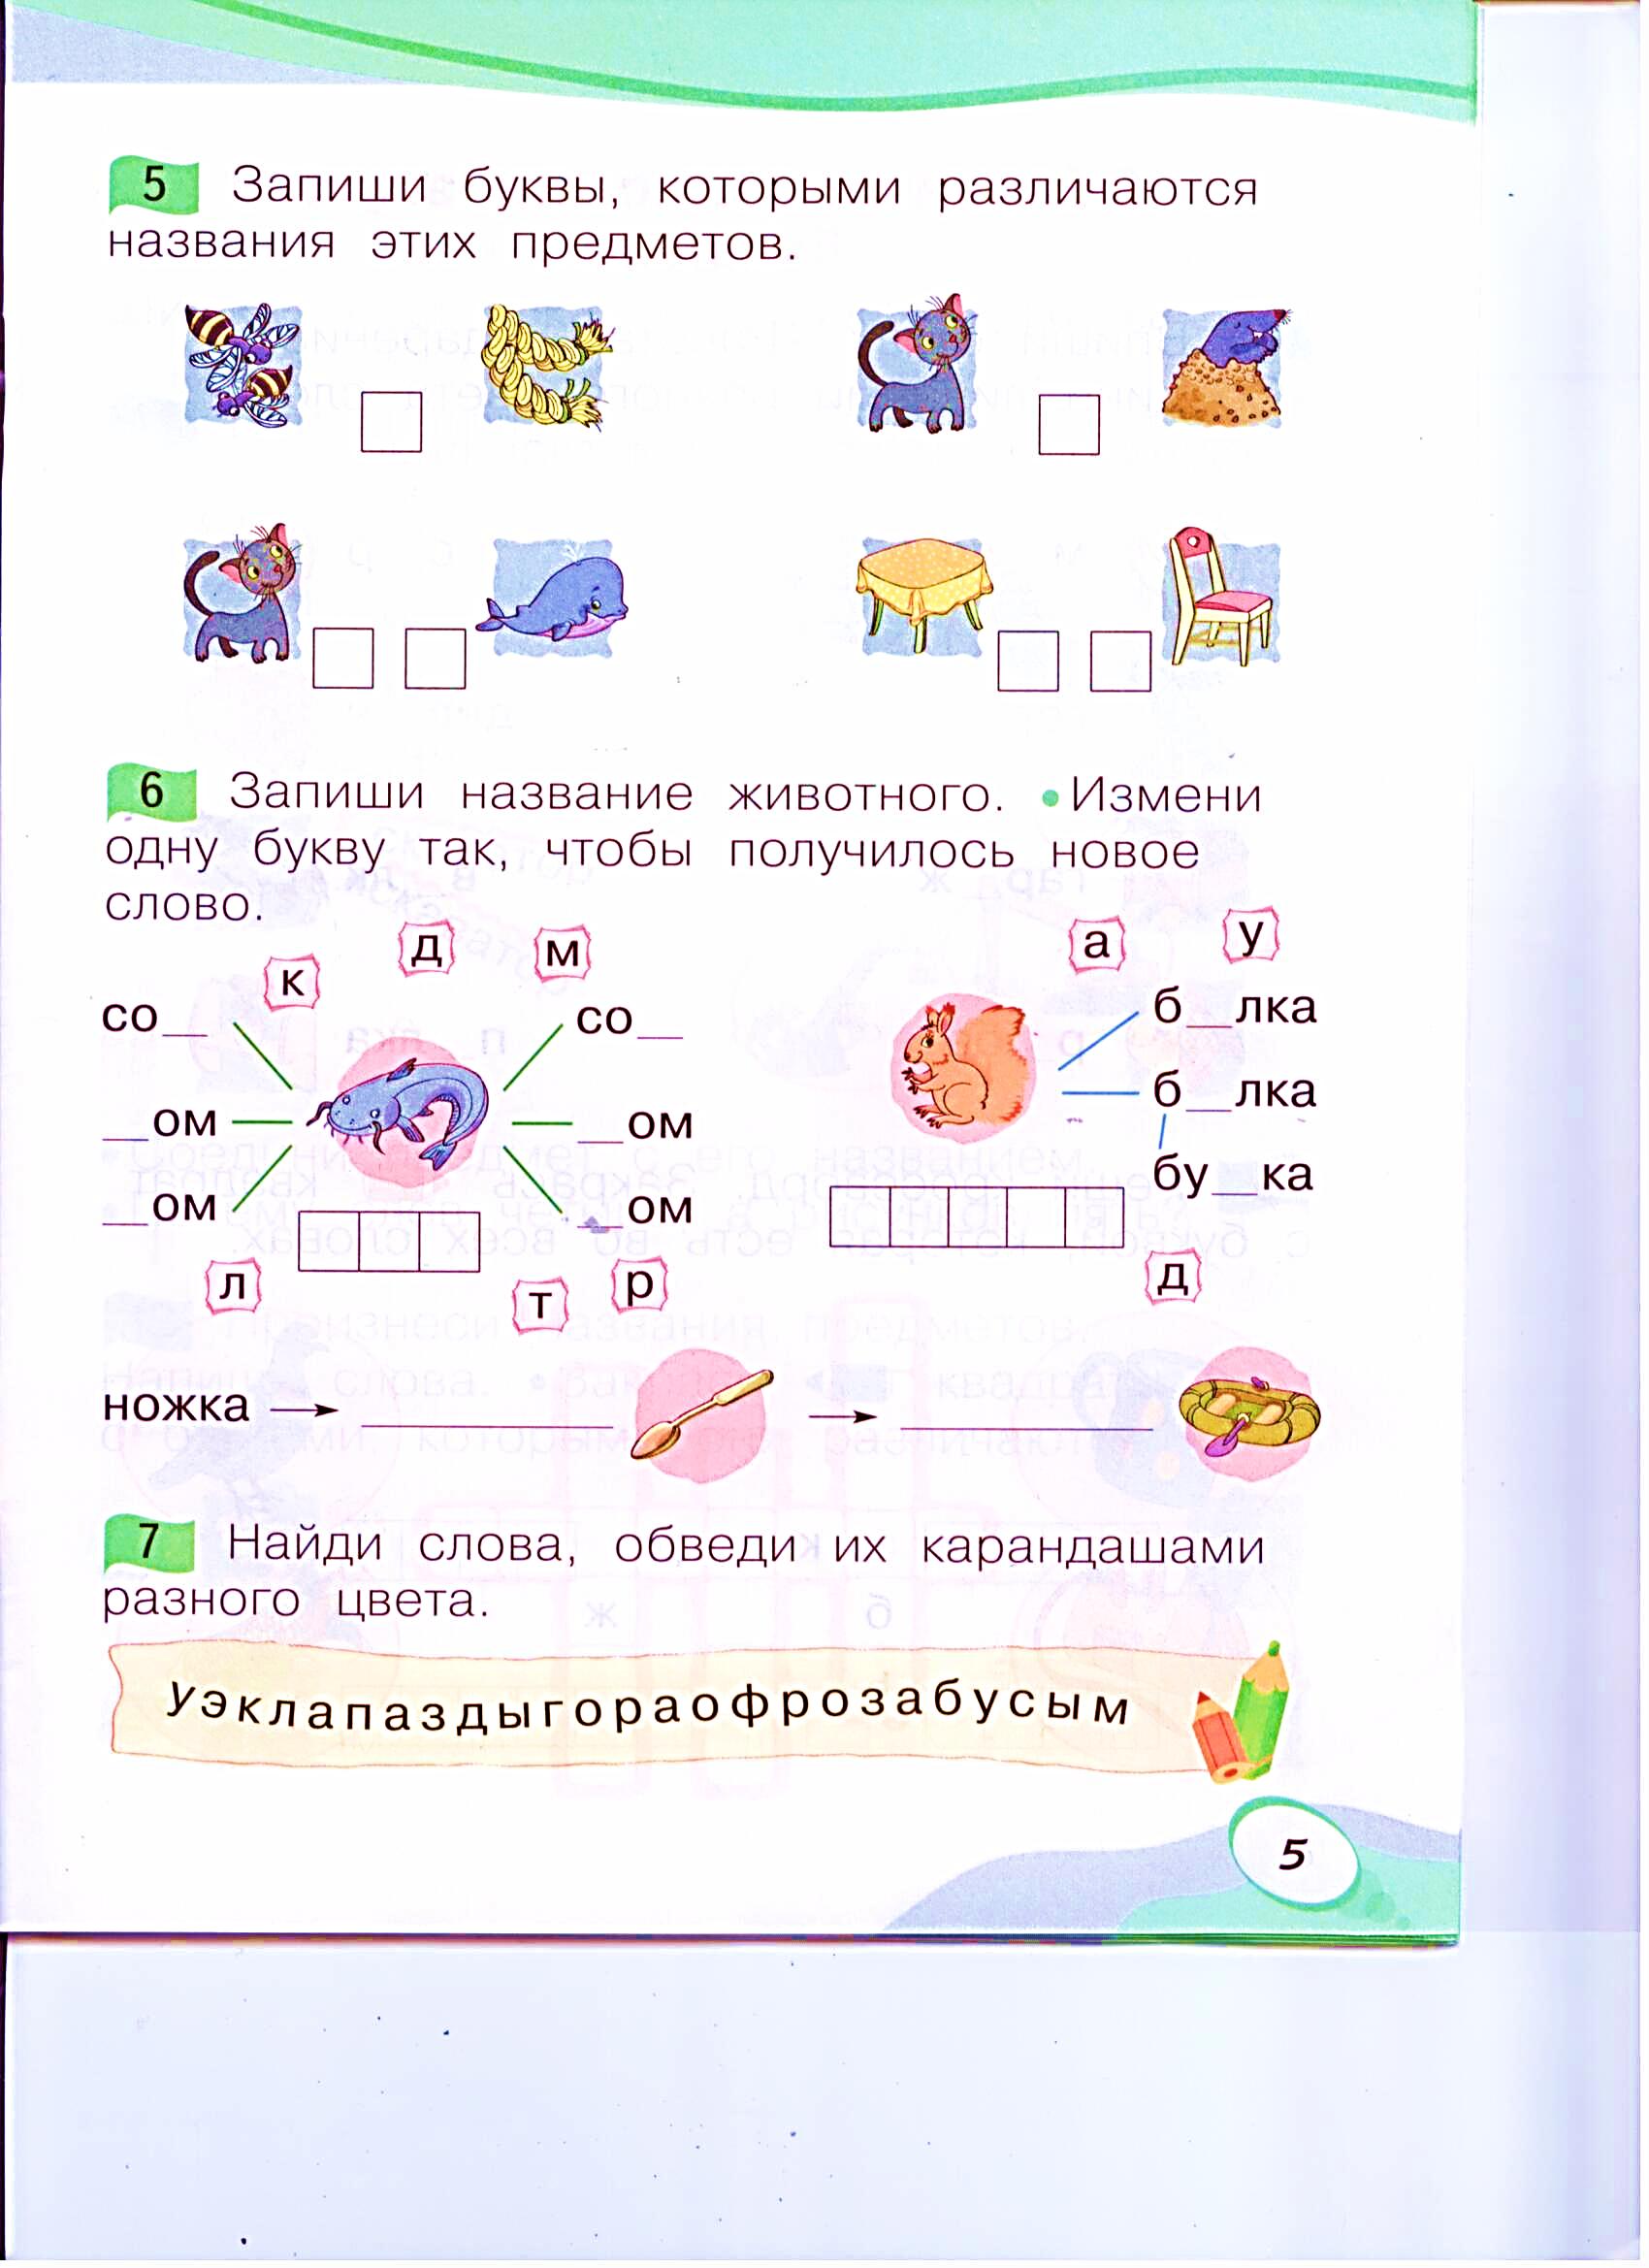 C:\Users\Рангулова\Pictures\2015-12-21 1\1 002.jpg